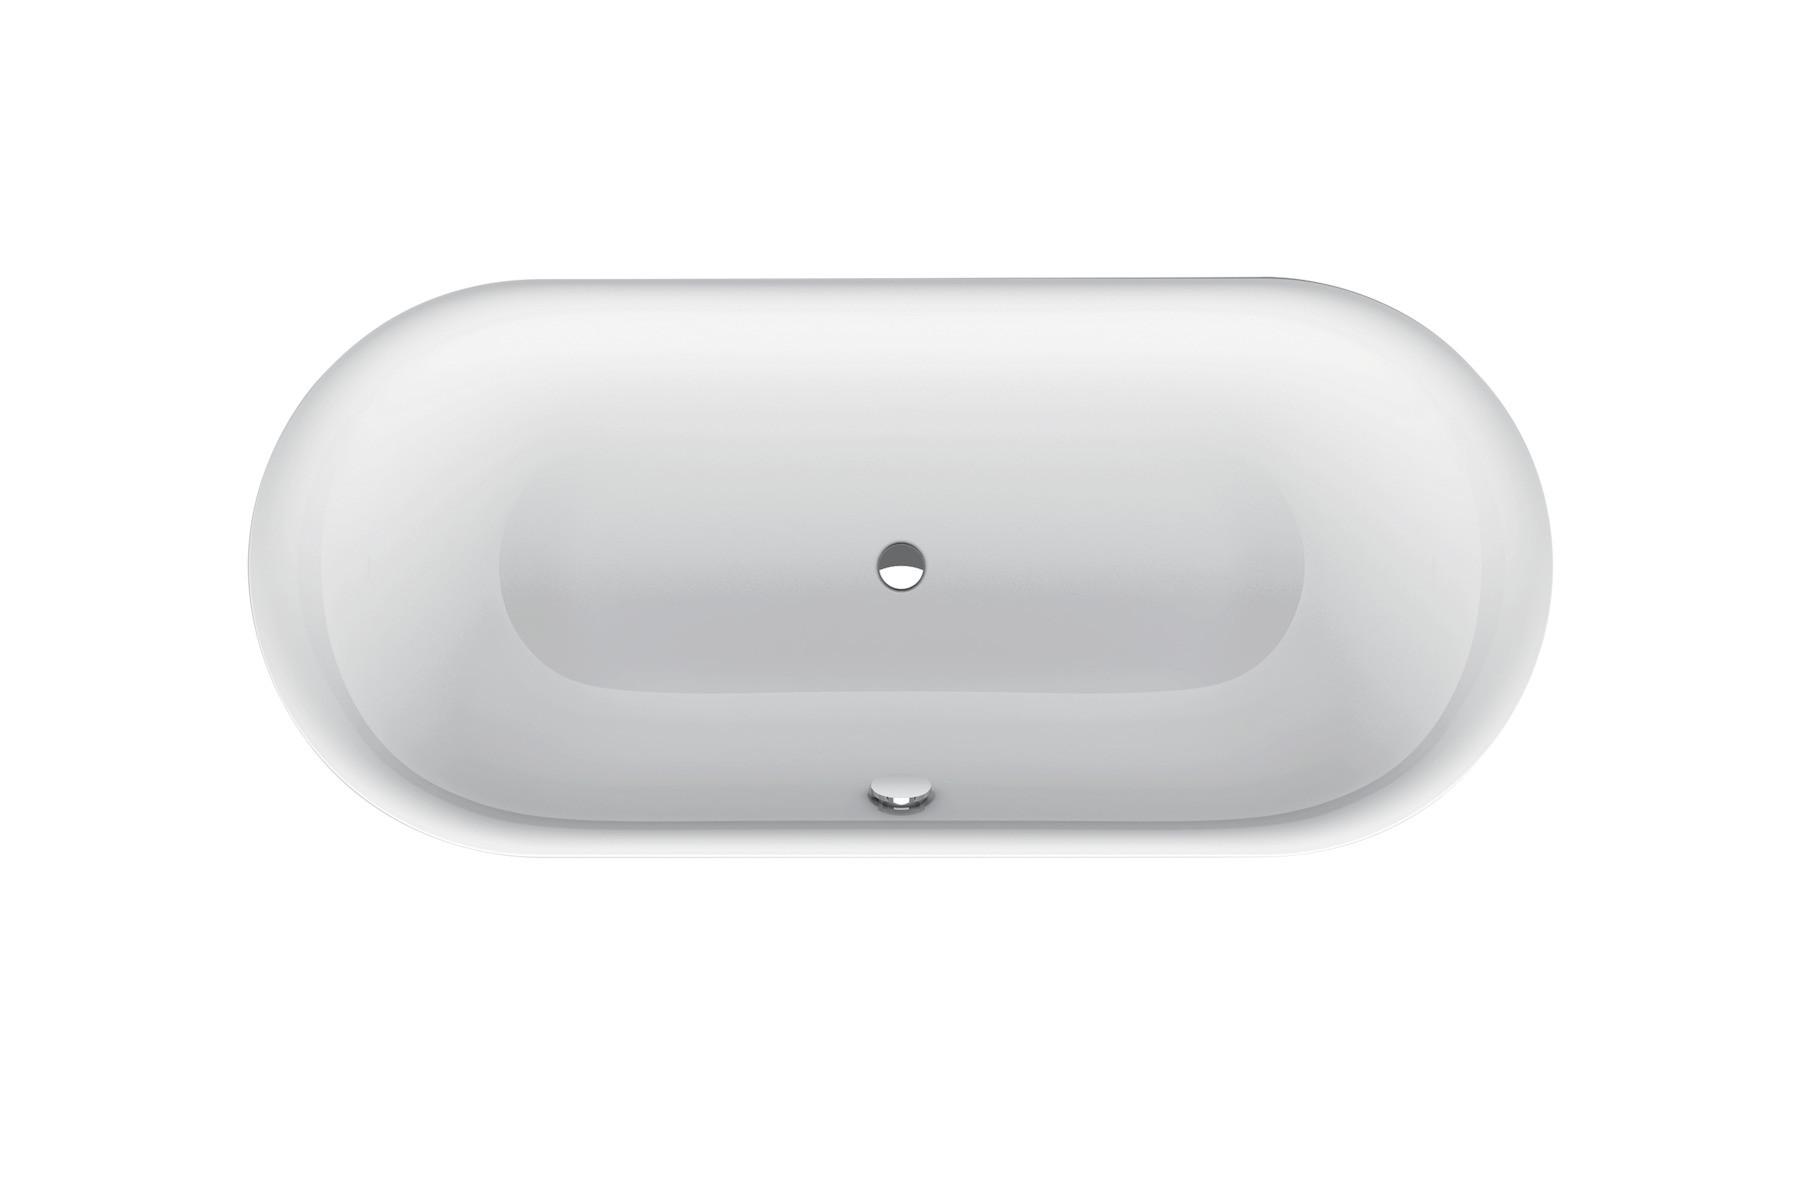 Bette Lux Oval - 1800×800 mm Manhattan (002) inkl. Antirutsch exkl. Wannenträger